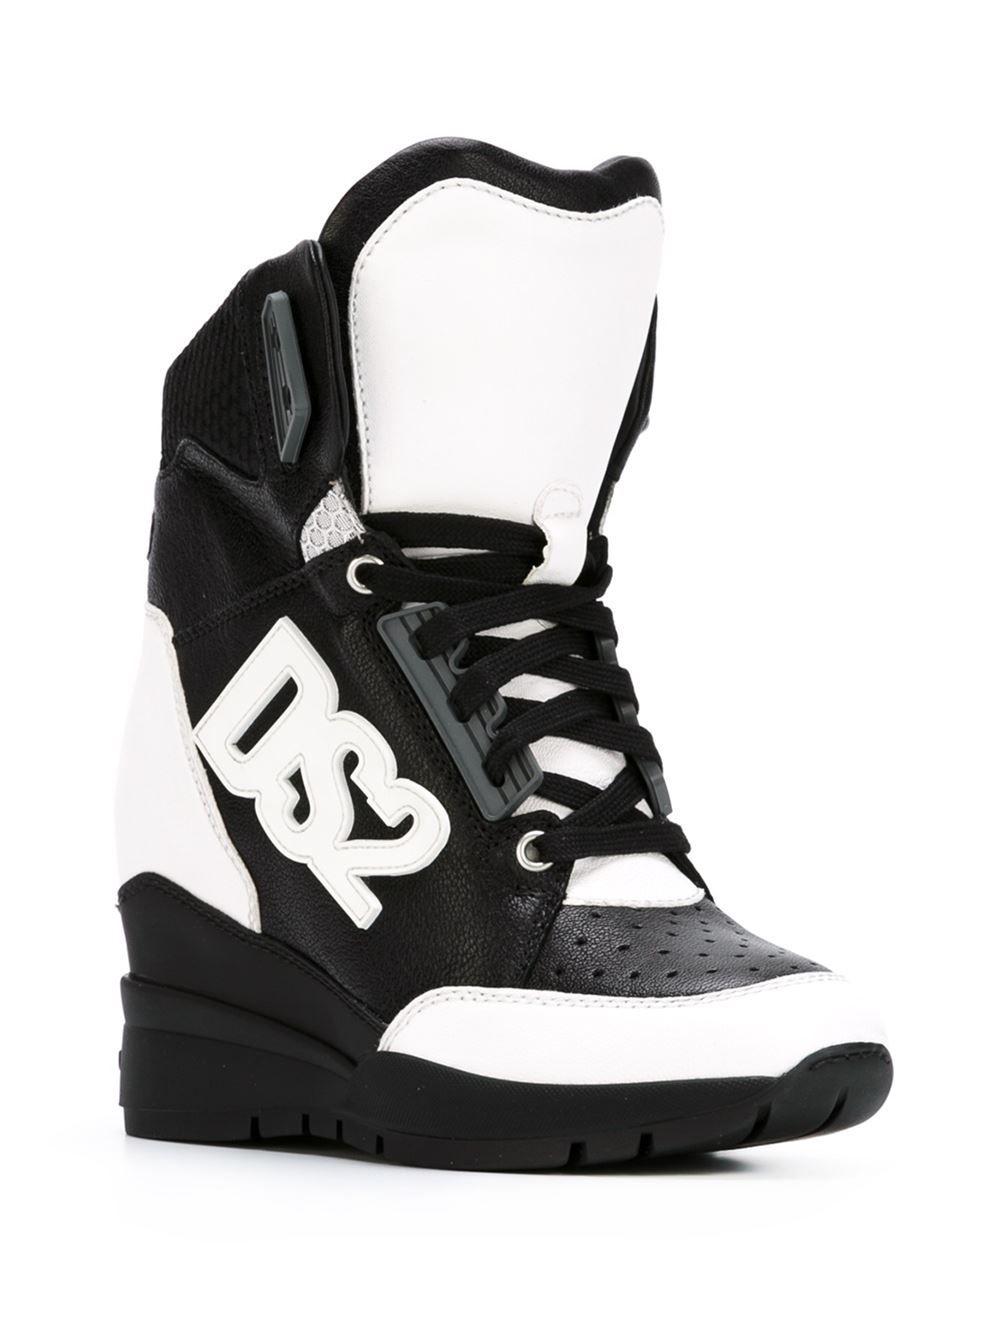 Keilabsatz Dsquared2 Top Sneakers Verdecktem High Mit kiZPXu